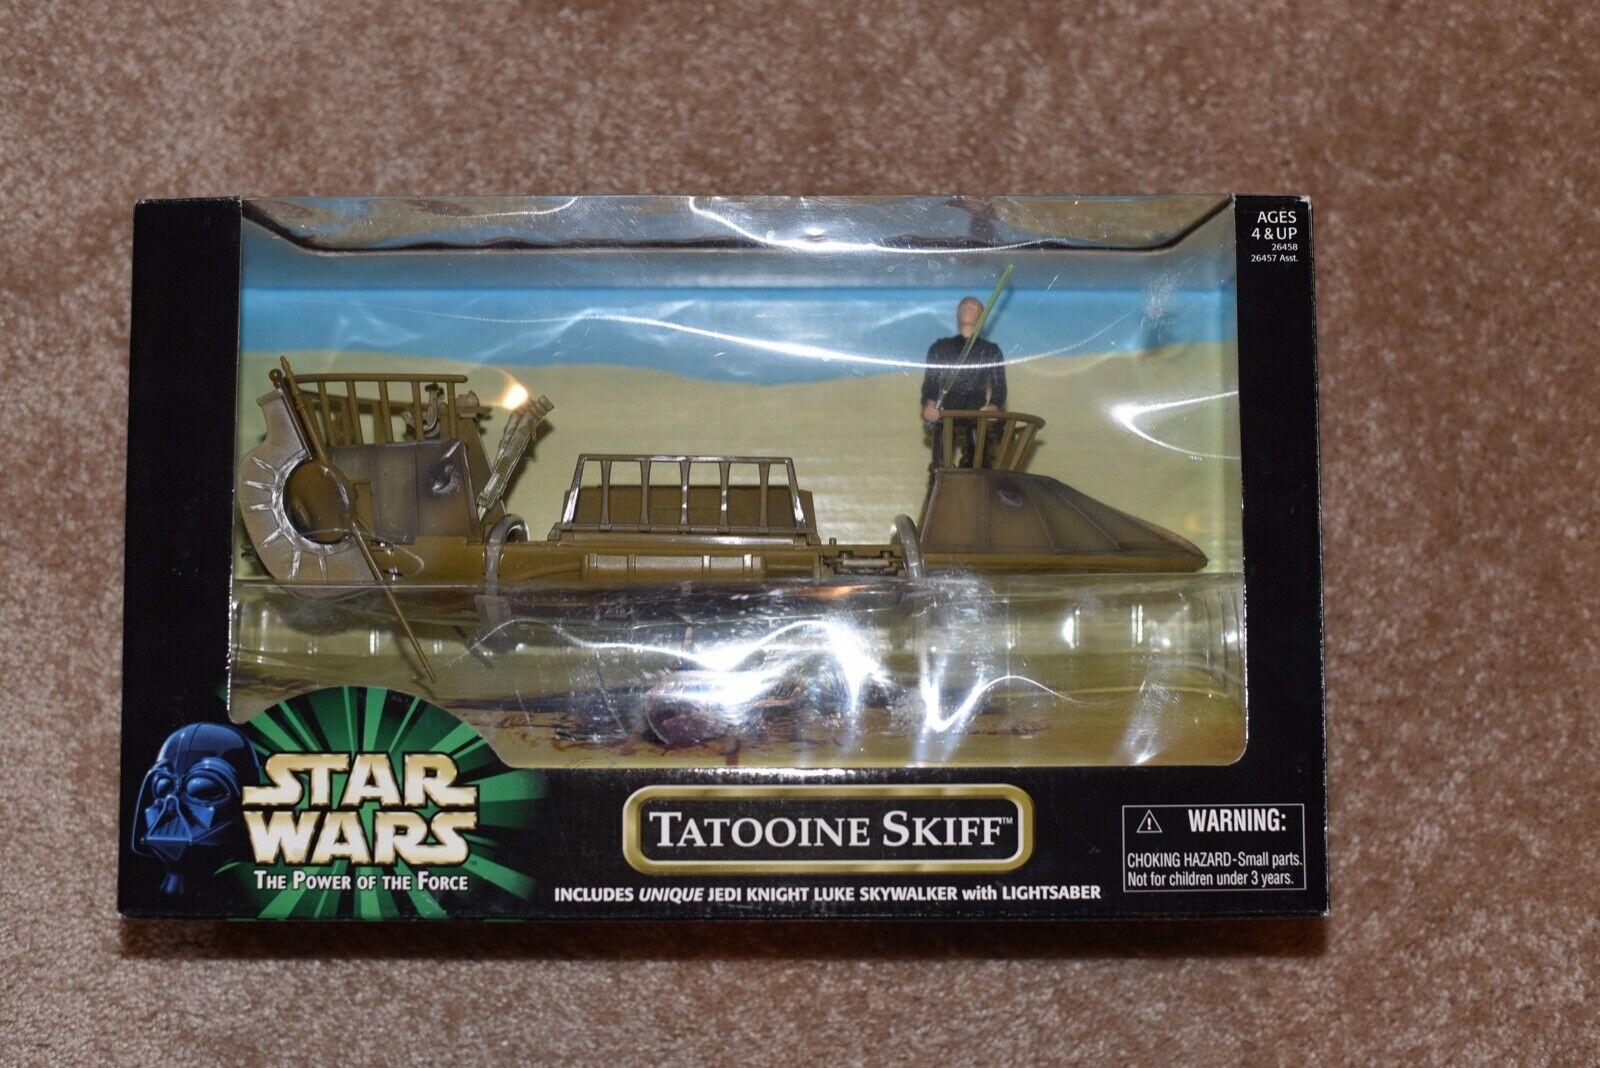 Star Wars - Power of the Force - Tatooine Skiff - NISB